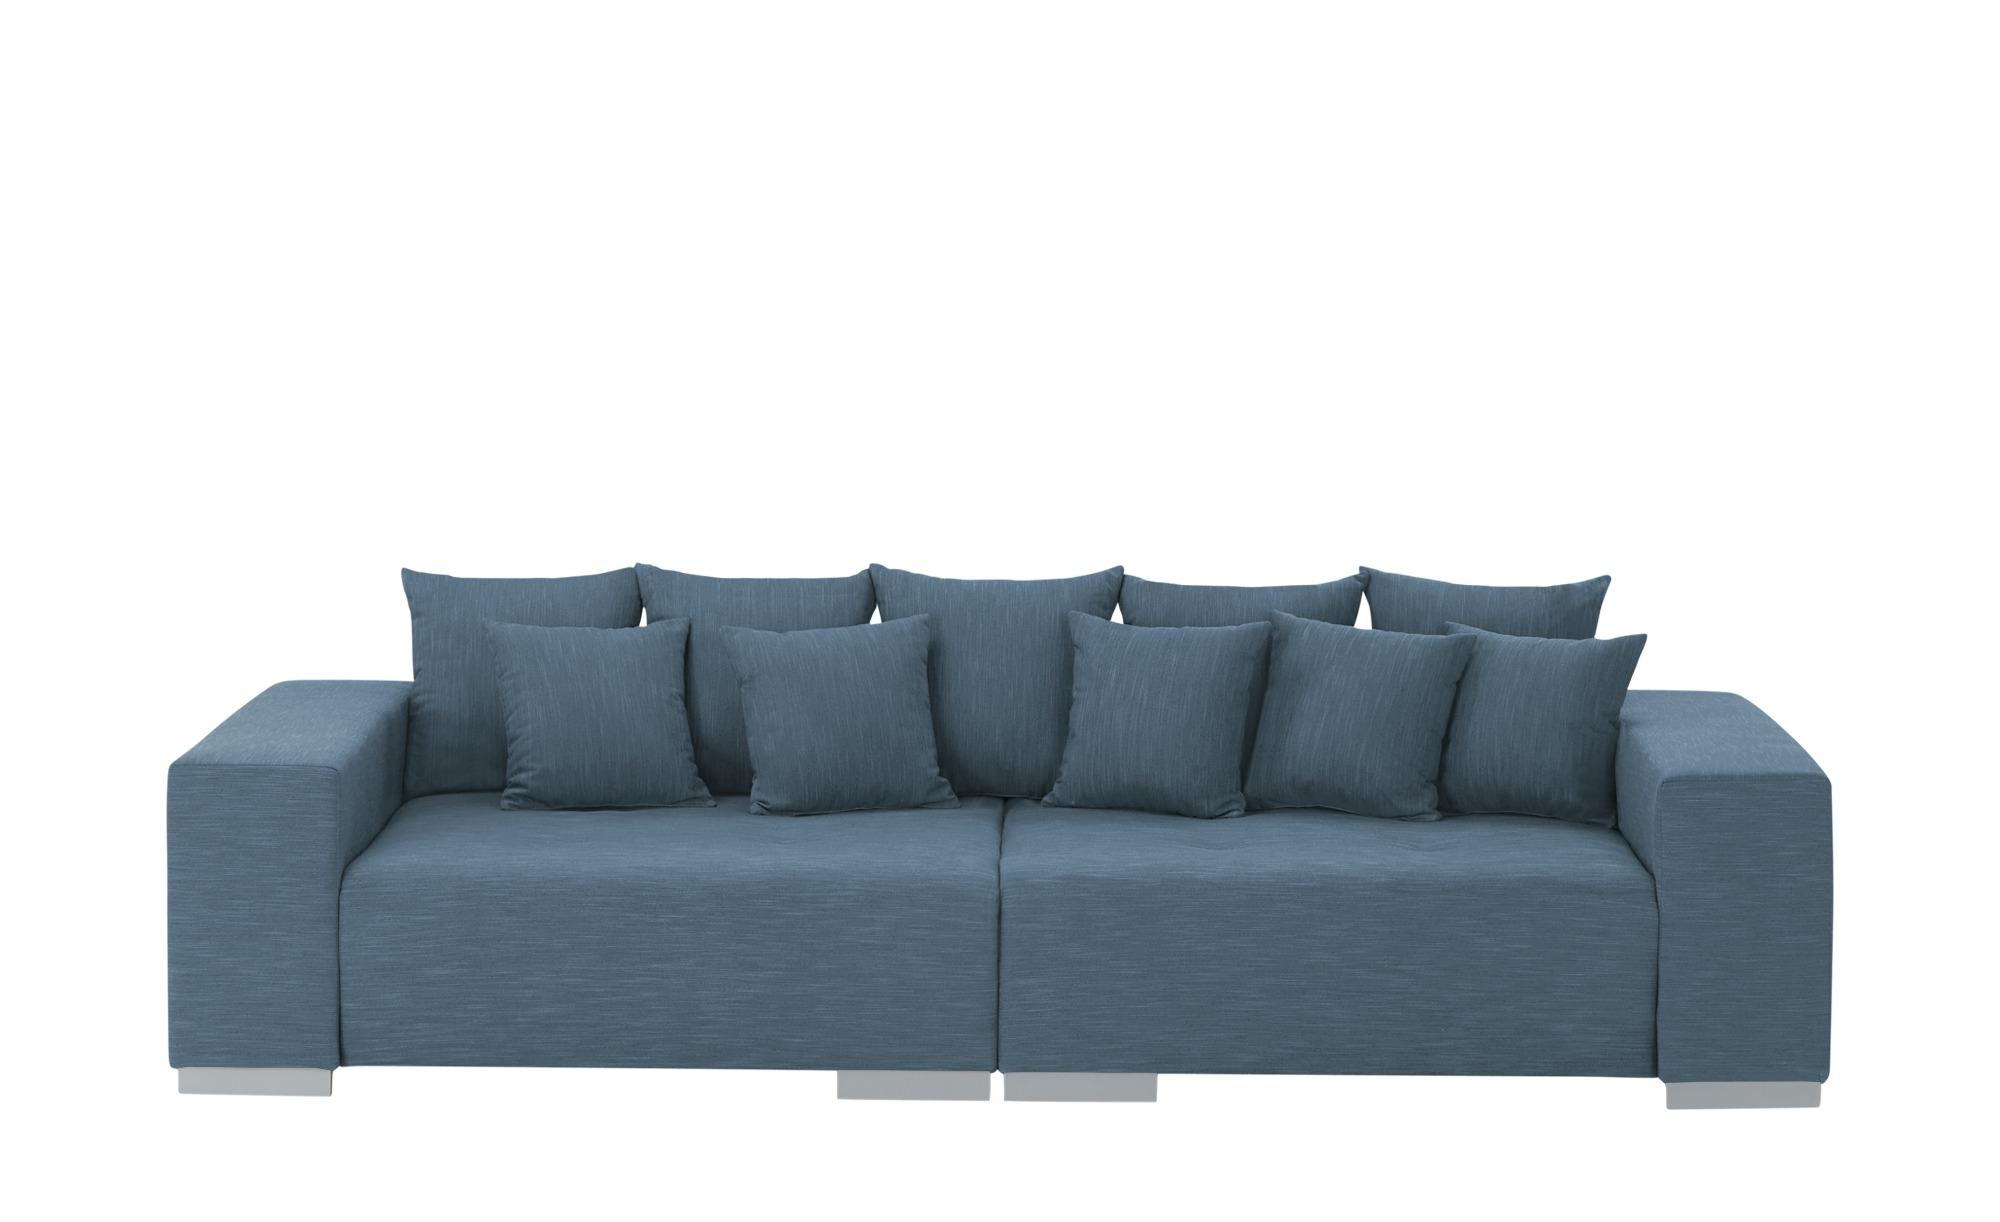 switch Big Sofa  Max ¦ blau ¦ Maße (cm): B: 300 H: 85 T: 136 Polstermöbel > Sofas > Big-Sofas - Höffner